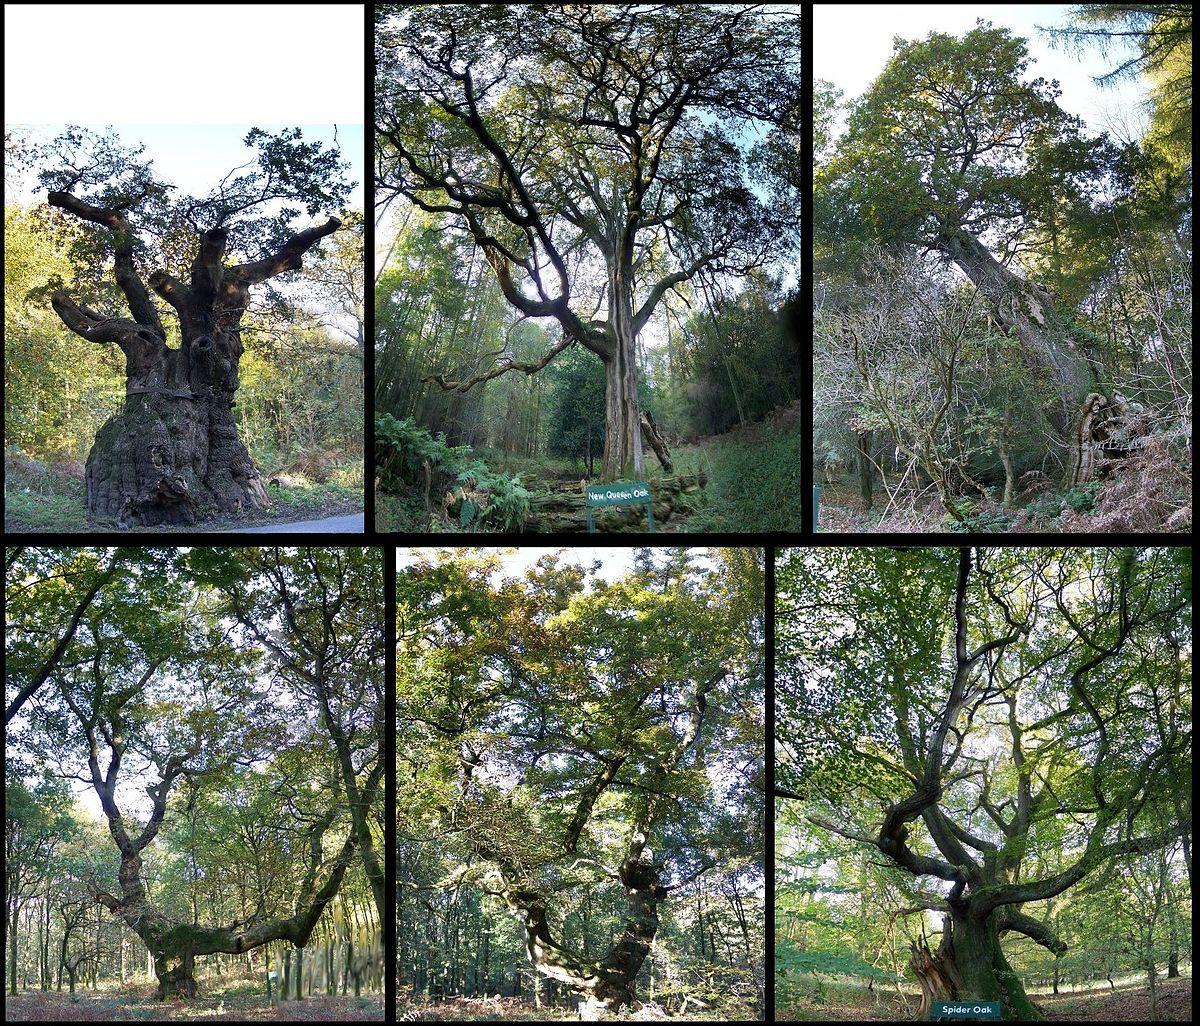 savernake forest wikipedia